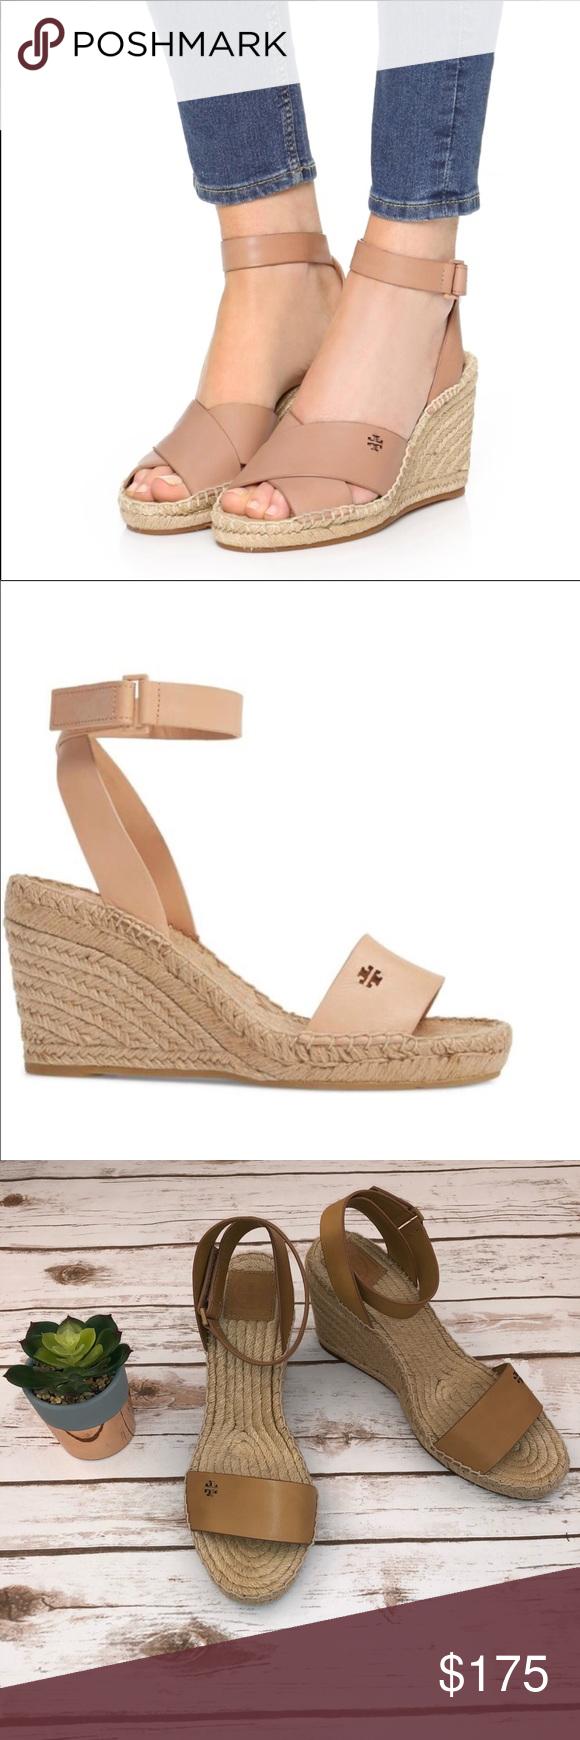 24a800312 Tory Burch Bima Wedge Espadrille Sandals Size 9.5 Gorgeous and trendy Bima  Wedge Espadrilles from Tory